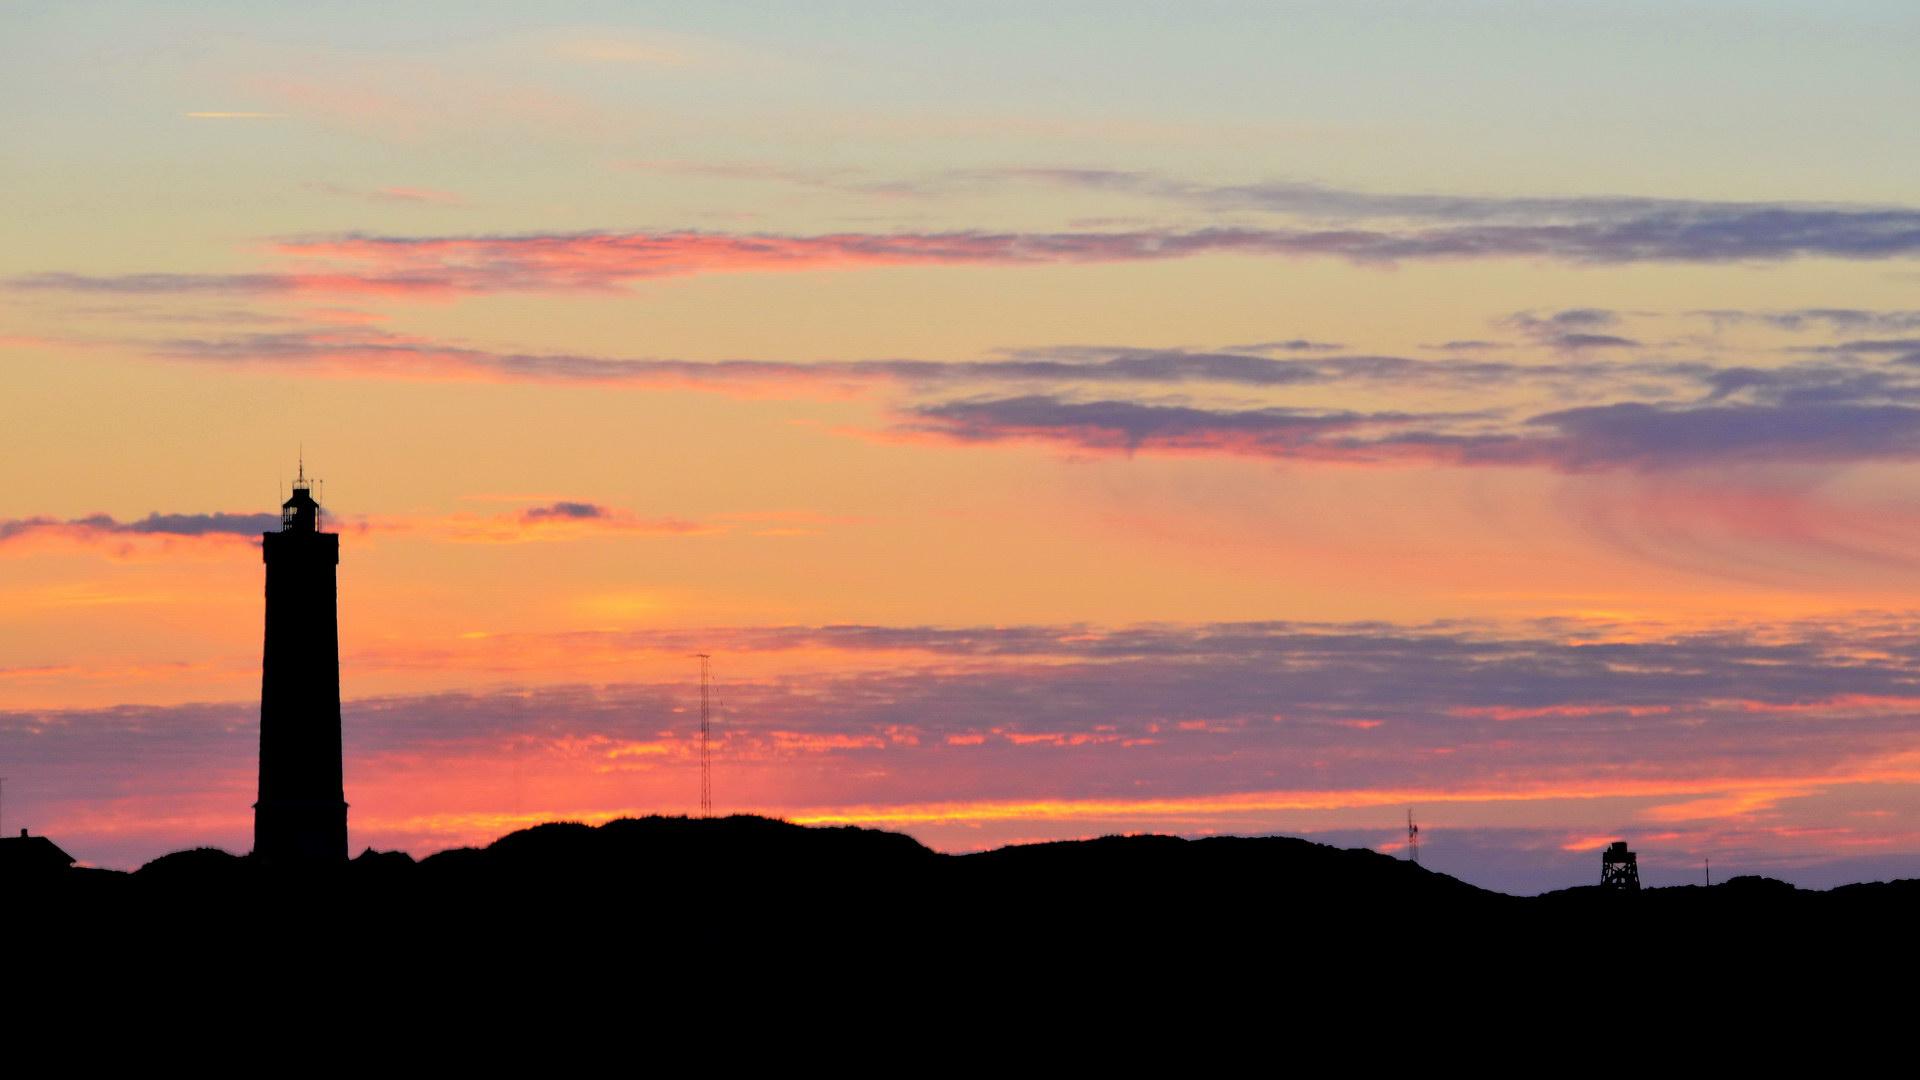 Leuchtturm vorm Sonnenuntergang Silhouette Landfläche Wolken Rot Blau